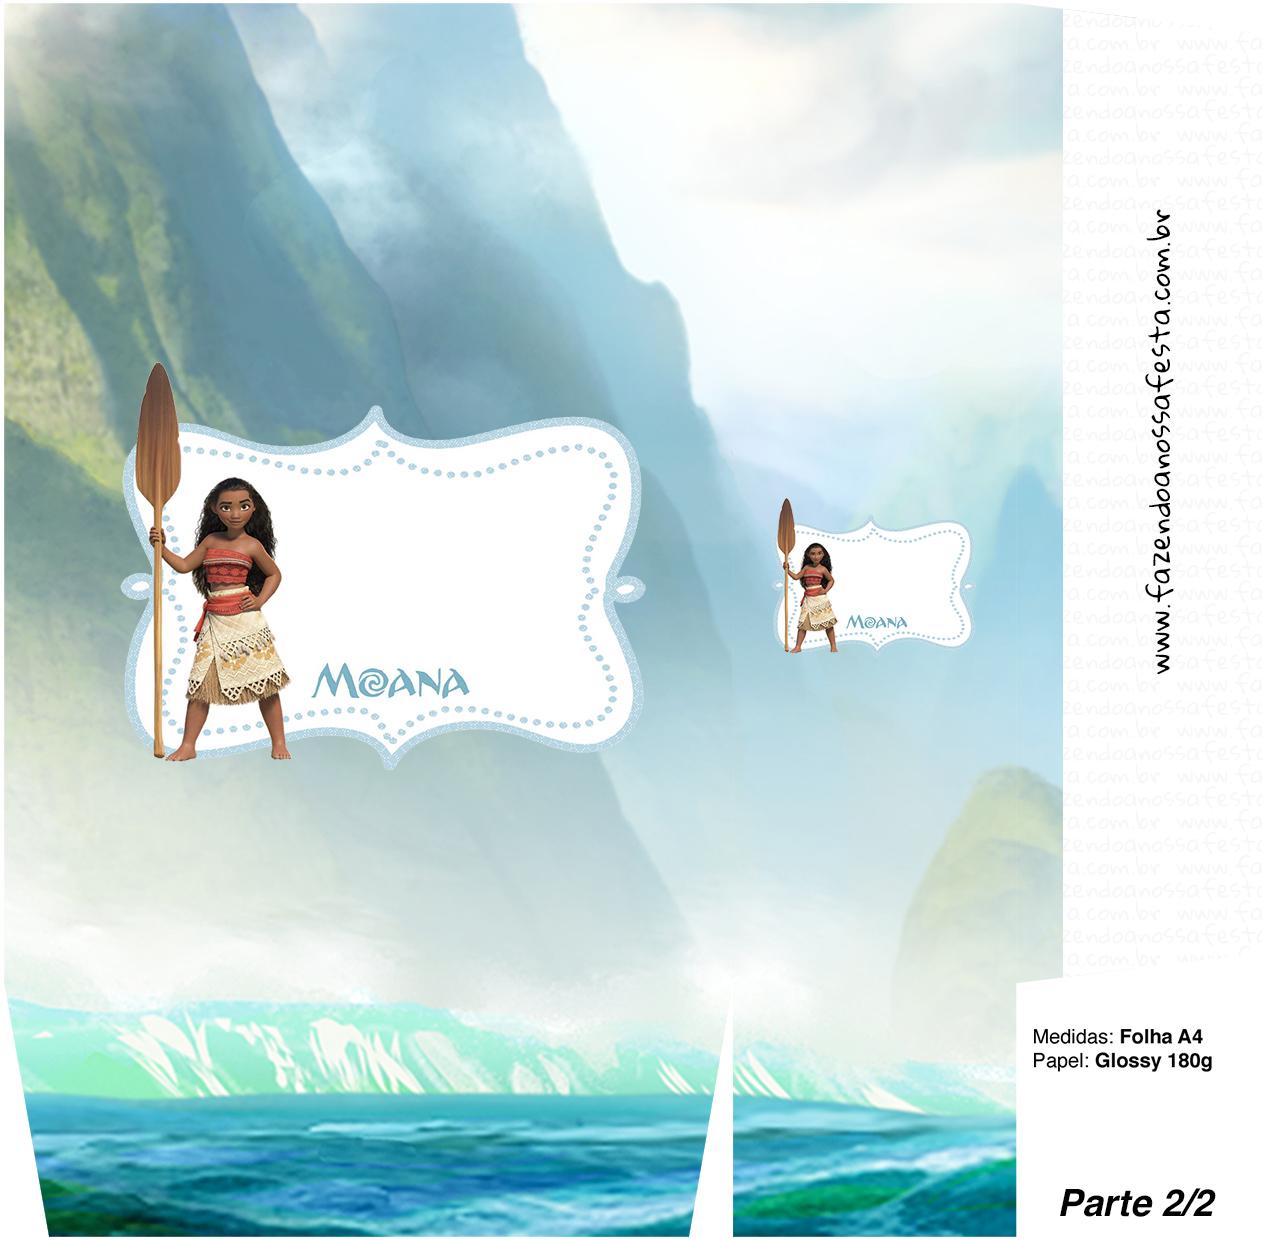 Sacolinha Kit Moana - parte 2